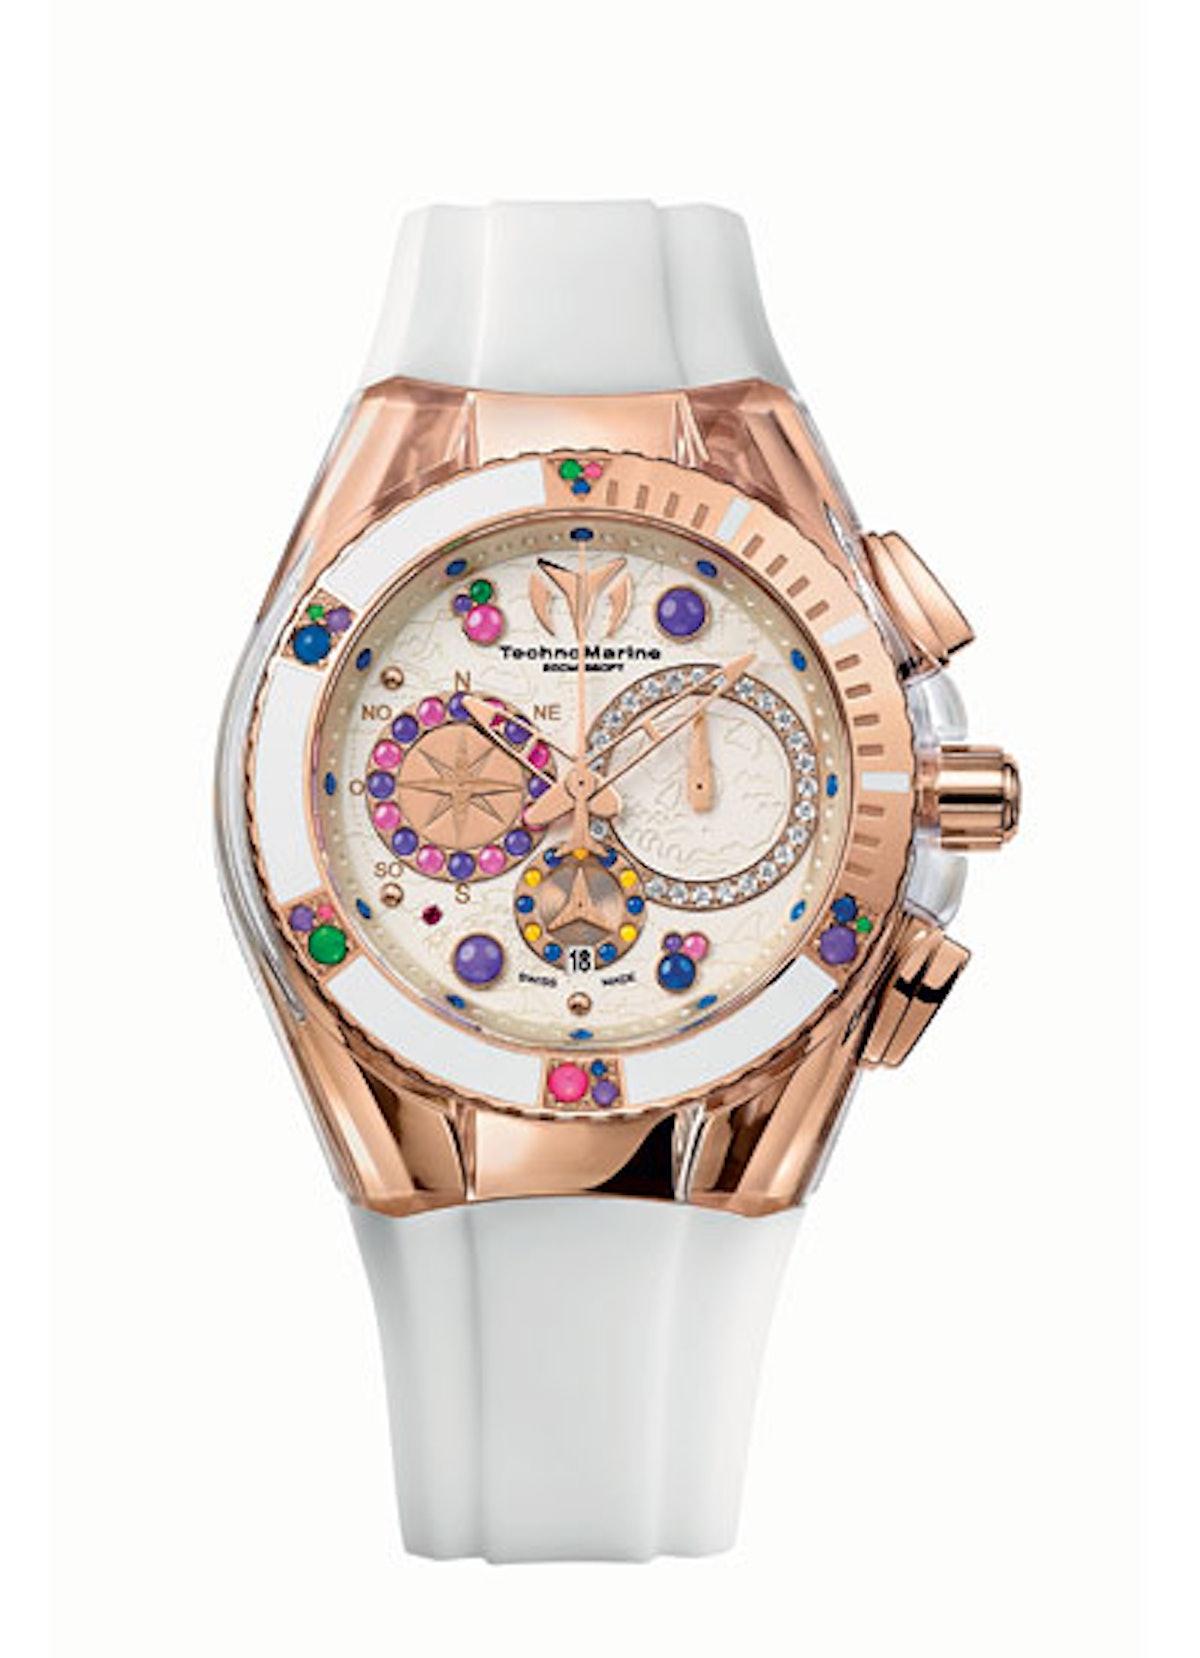 acss-basel-watches-roundup-08-v.jpg